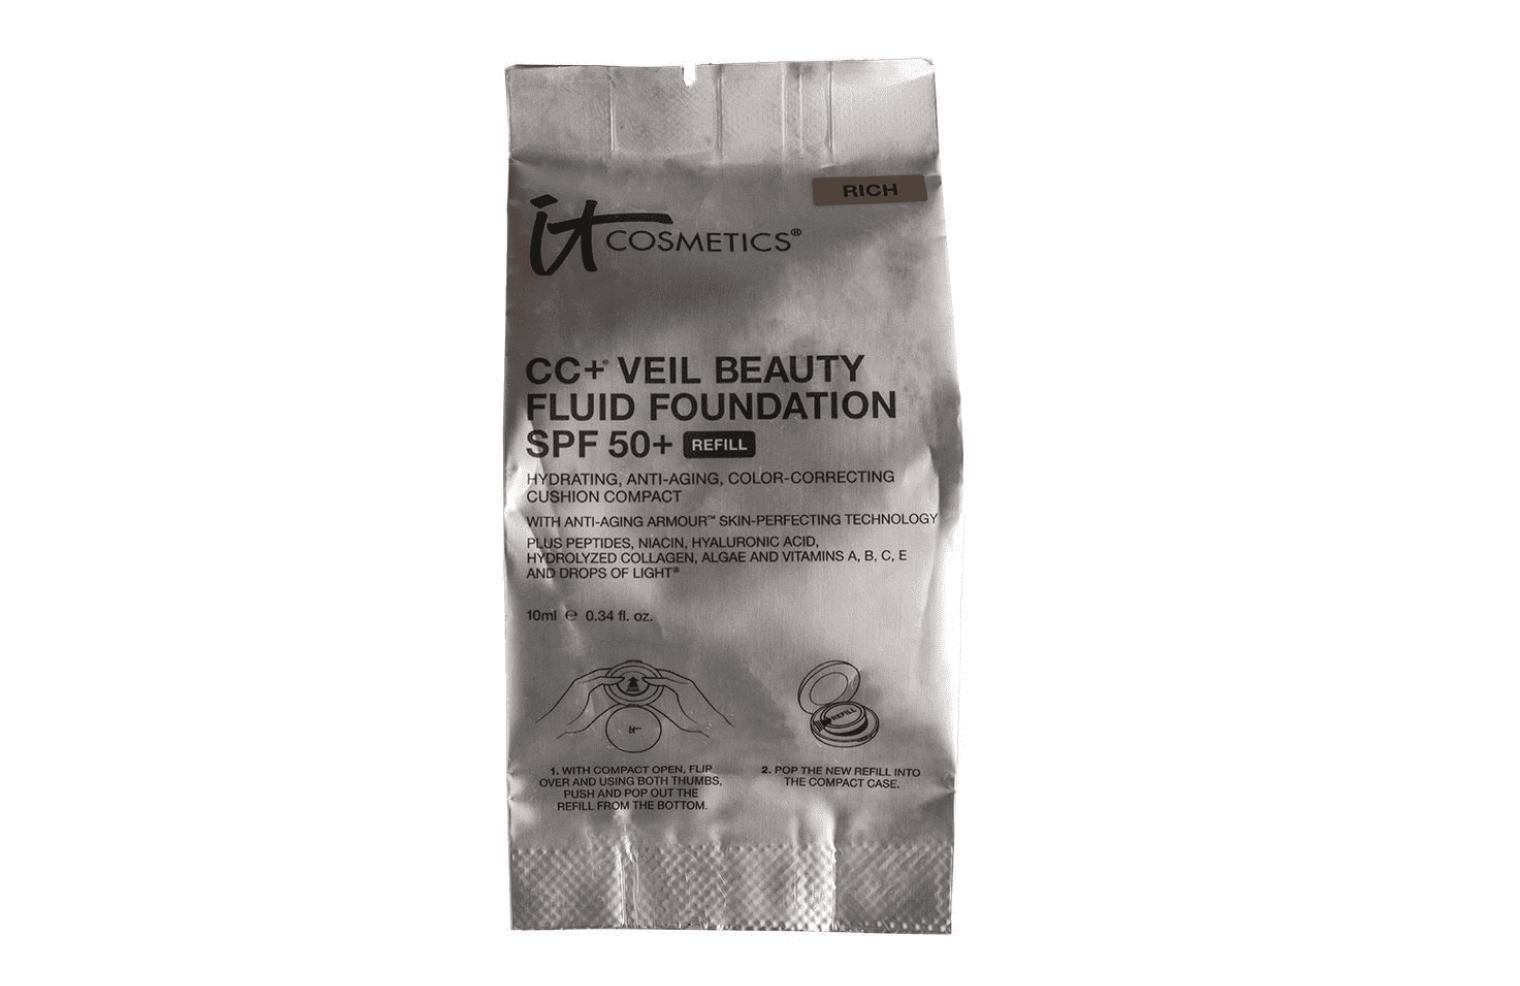 IT Cosmetics CC+ Veil Beauty Fluid Foundation SPF50+ Refill Rich